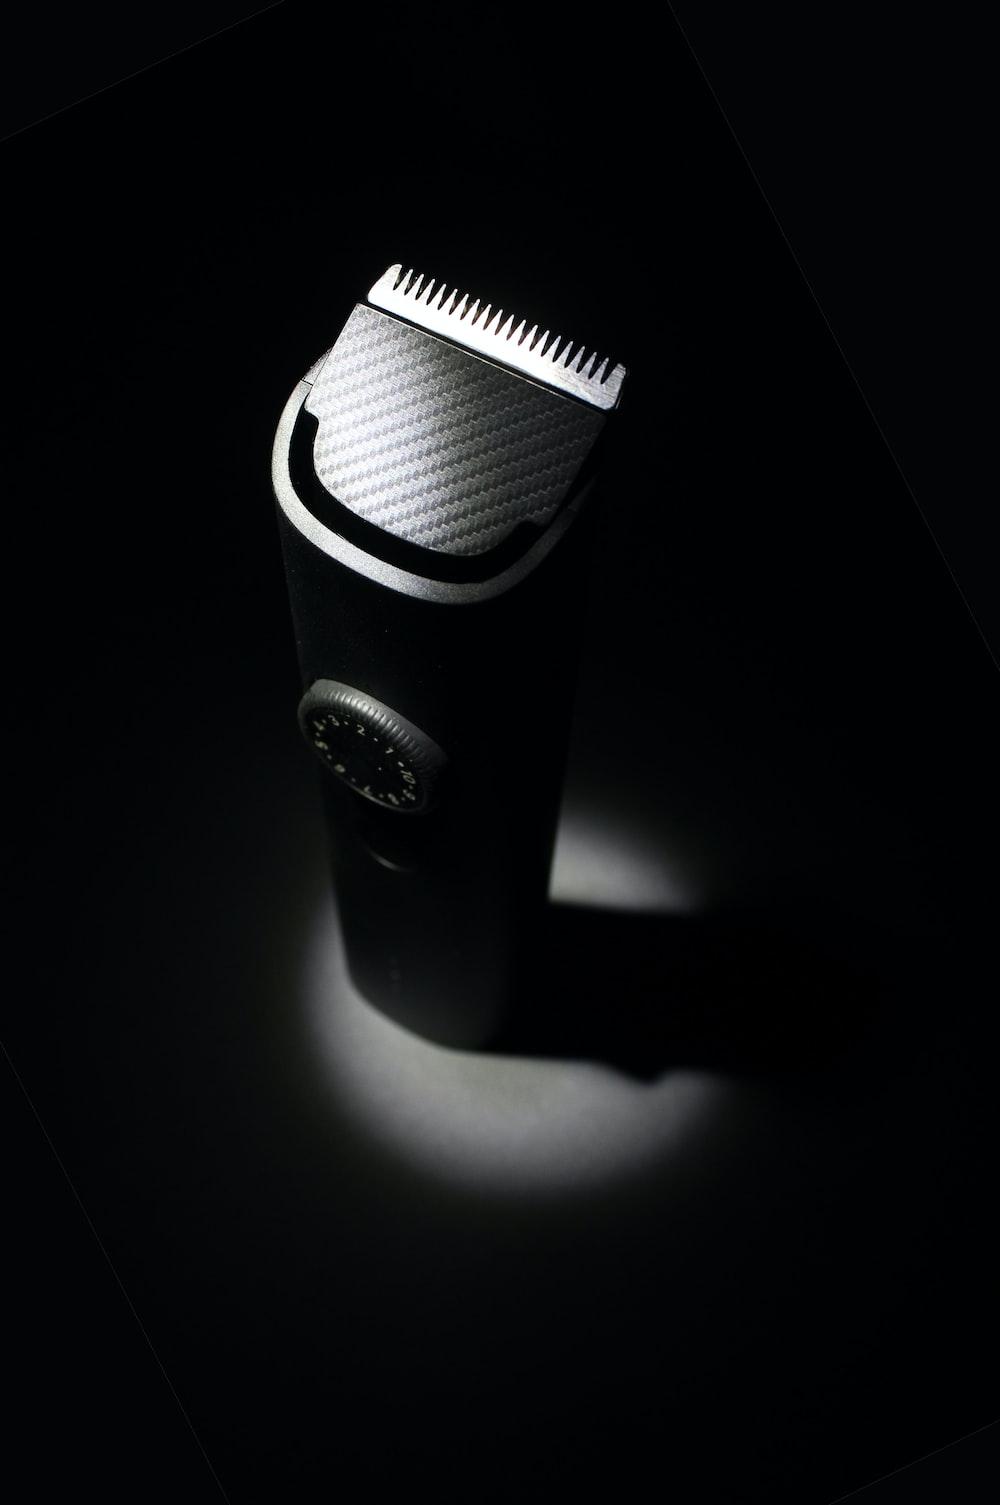 black and white camera lens